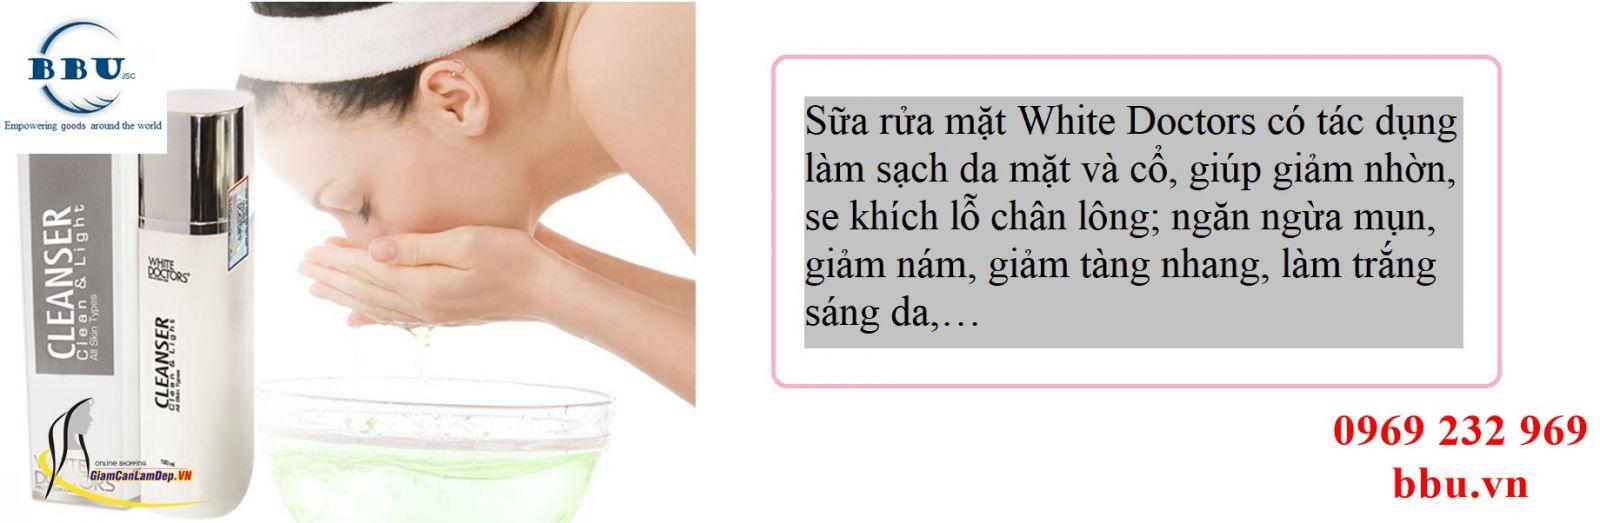 Sữa Rửa Mặt Ngăn Ngừa Mụn White Doctors